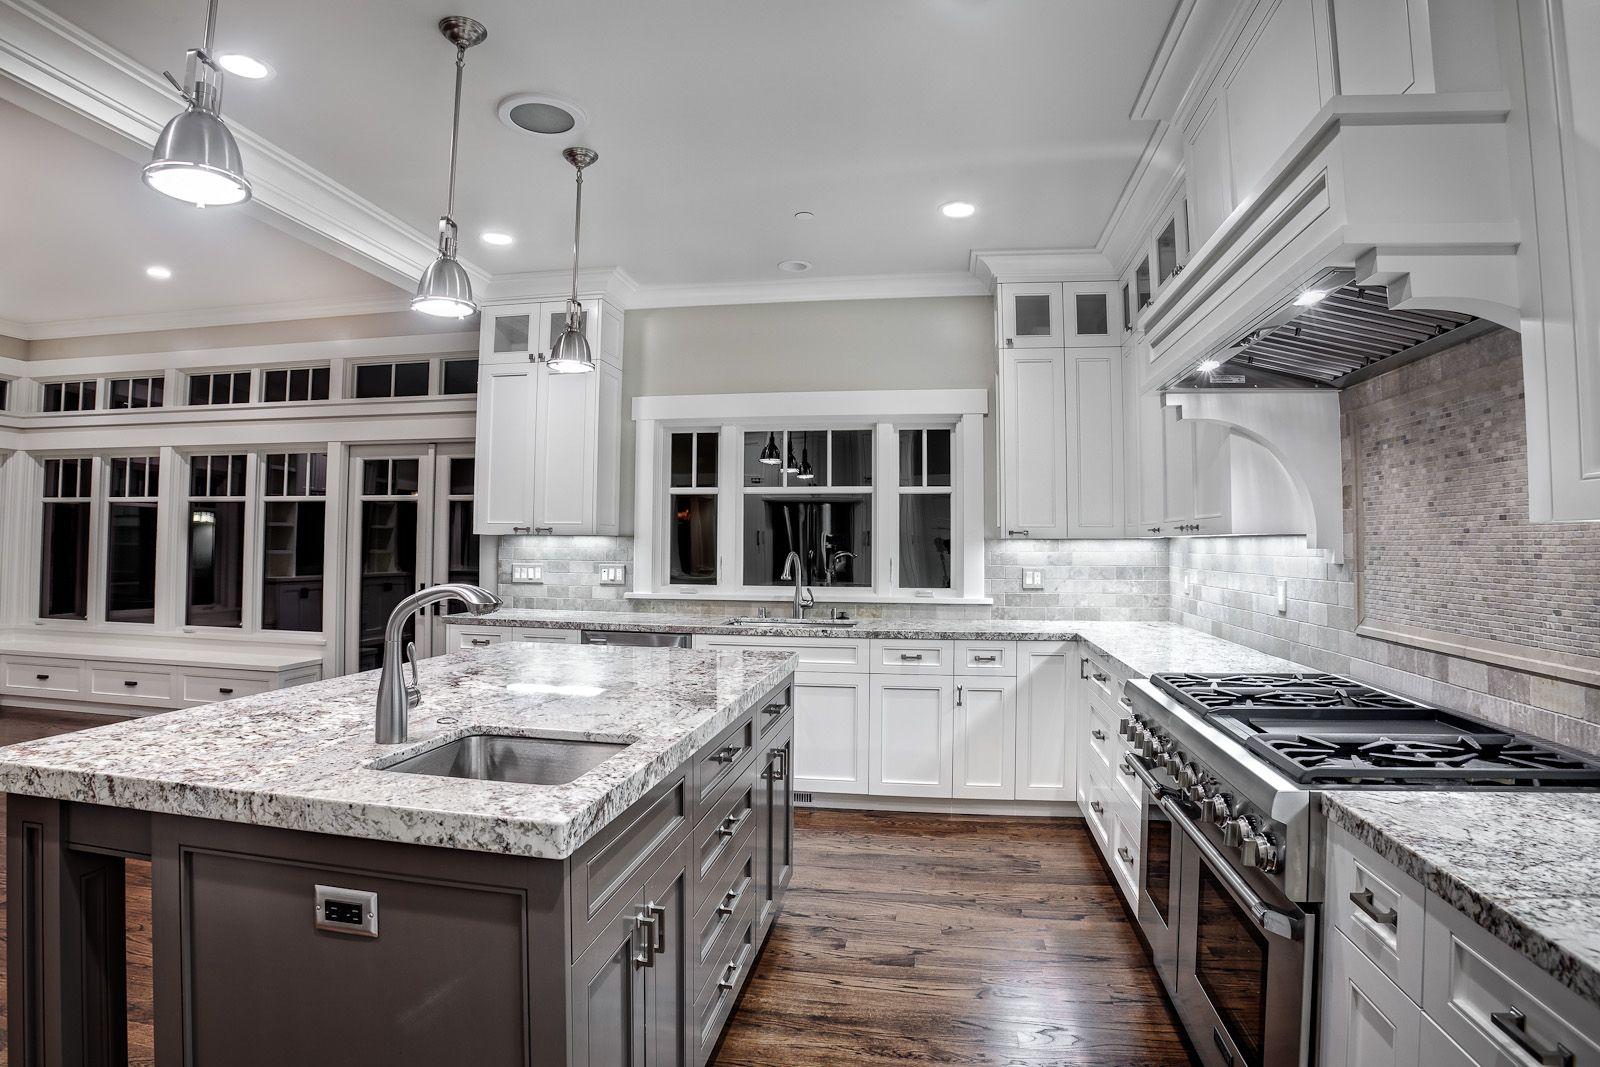 Backsplash Light Grey Shaker Style Kitchen Cabinet Painted In